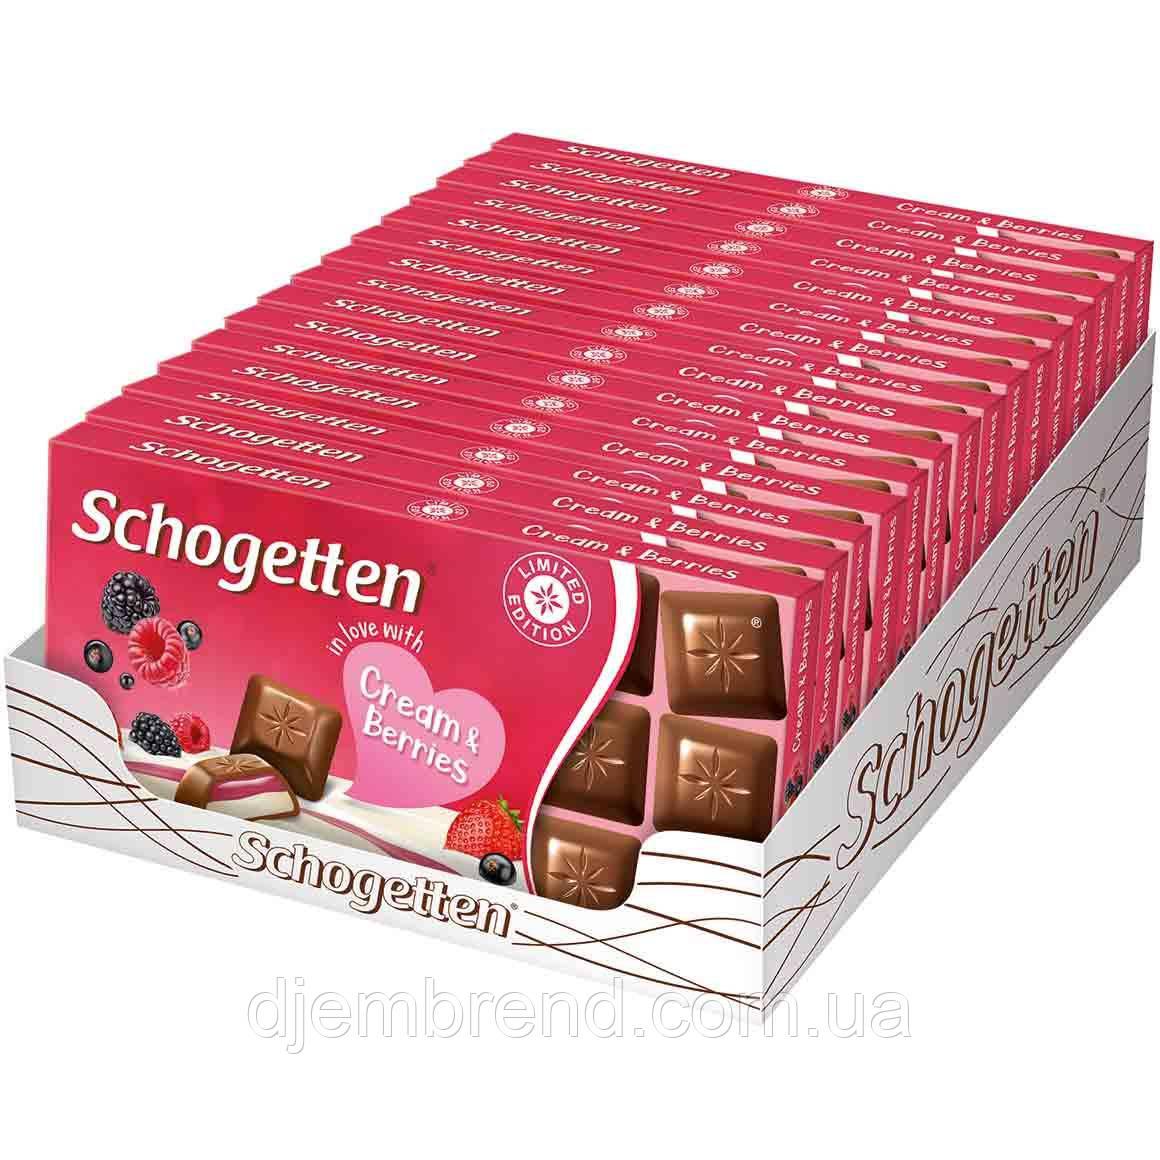 Шоколад с ягодами и кремом Schogetten Cream and Berries 100г